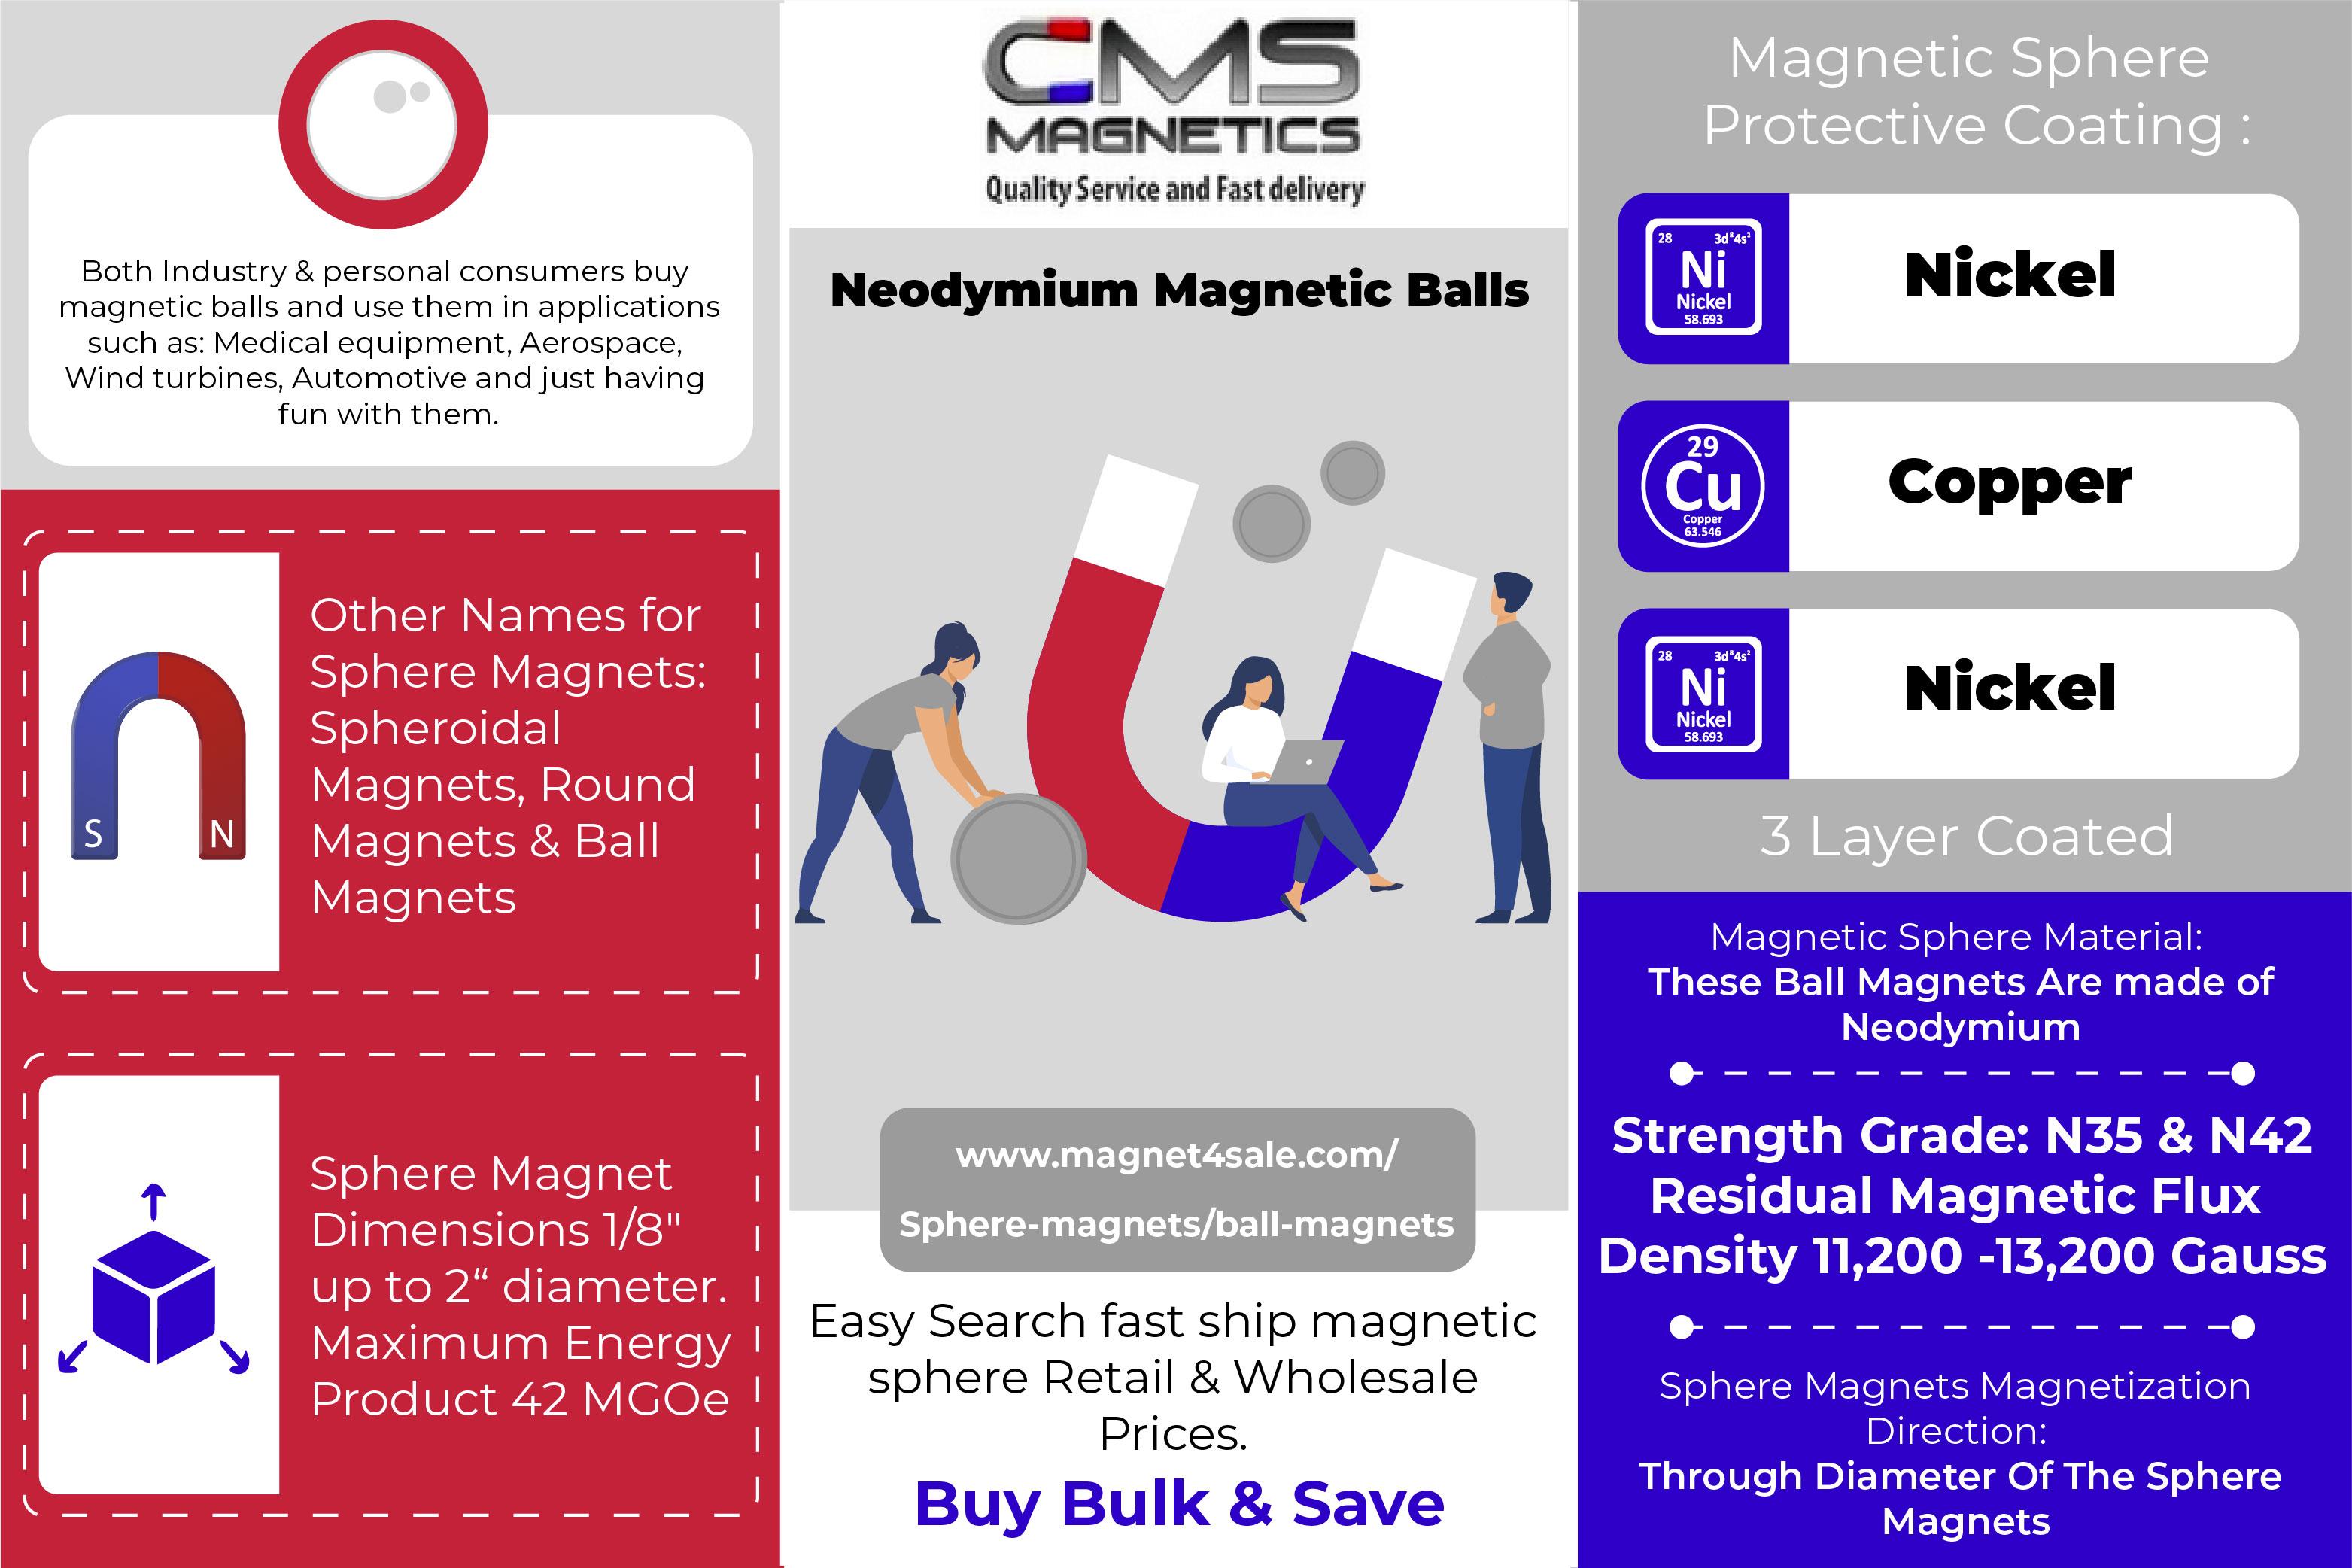 Neodymium Magnetic Balls  (Quick Learn Inforaphics)